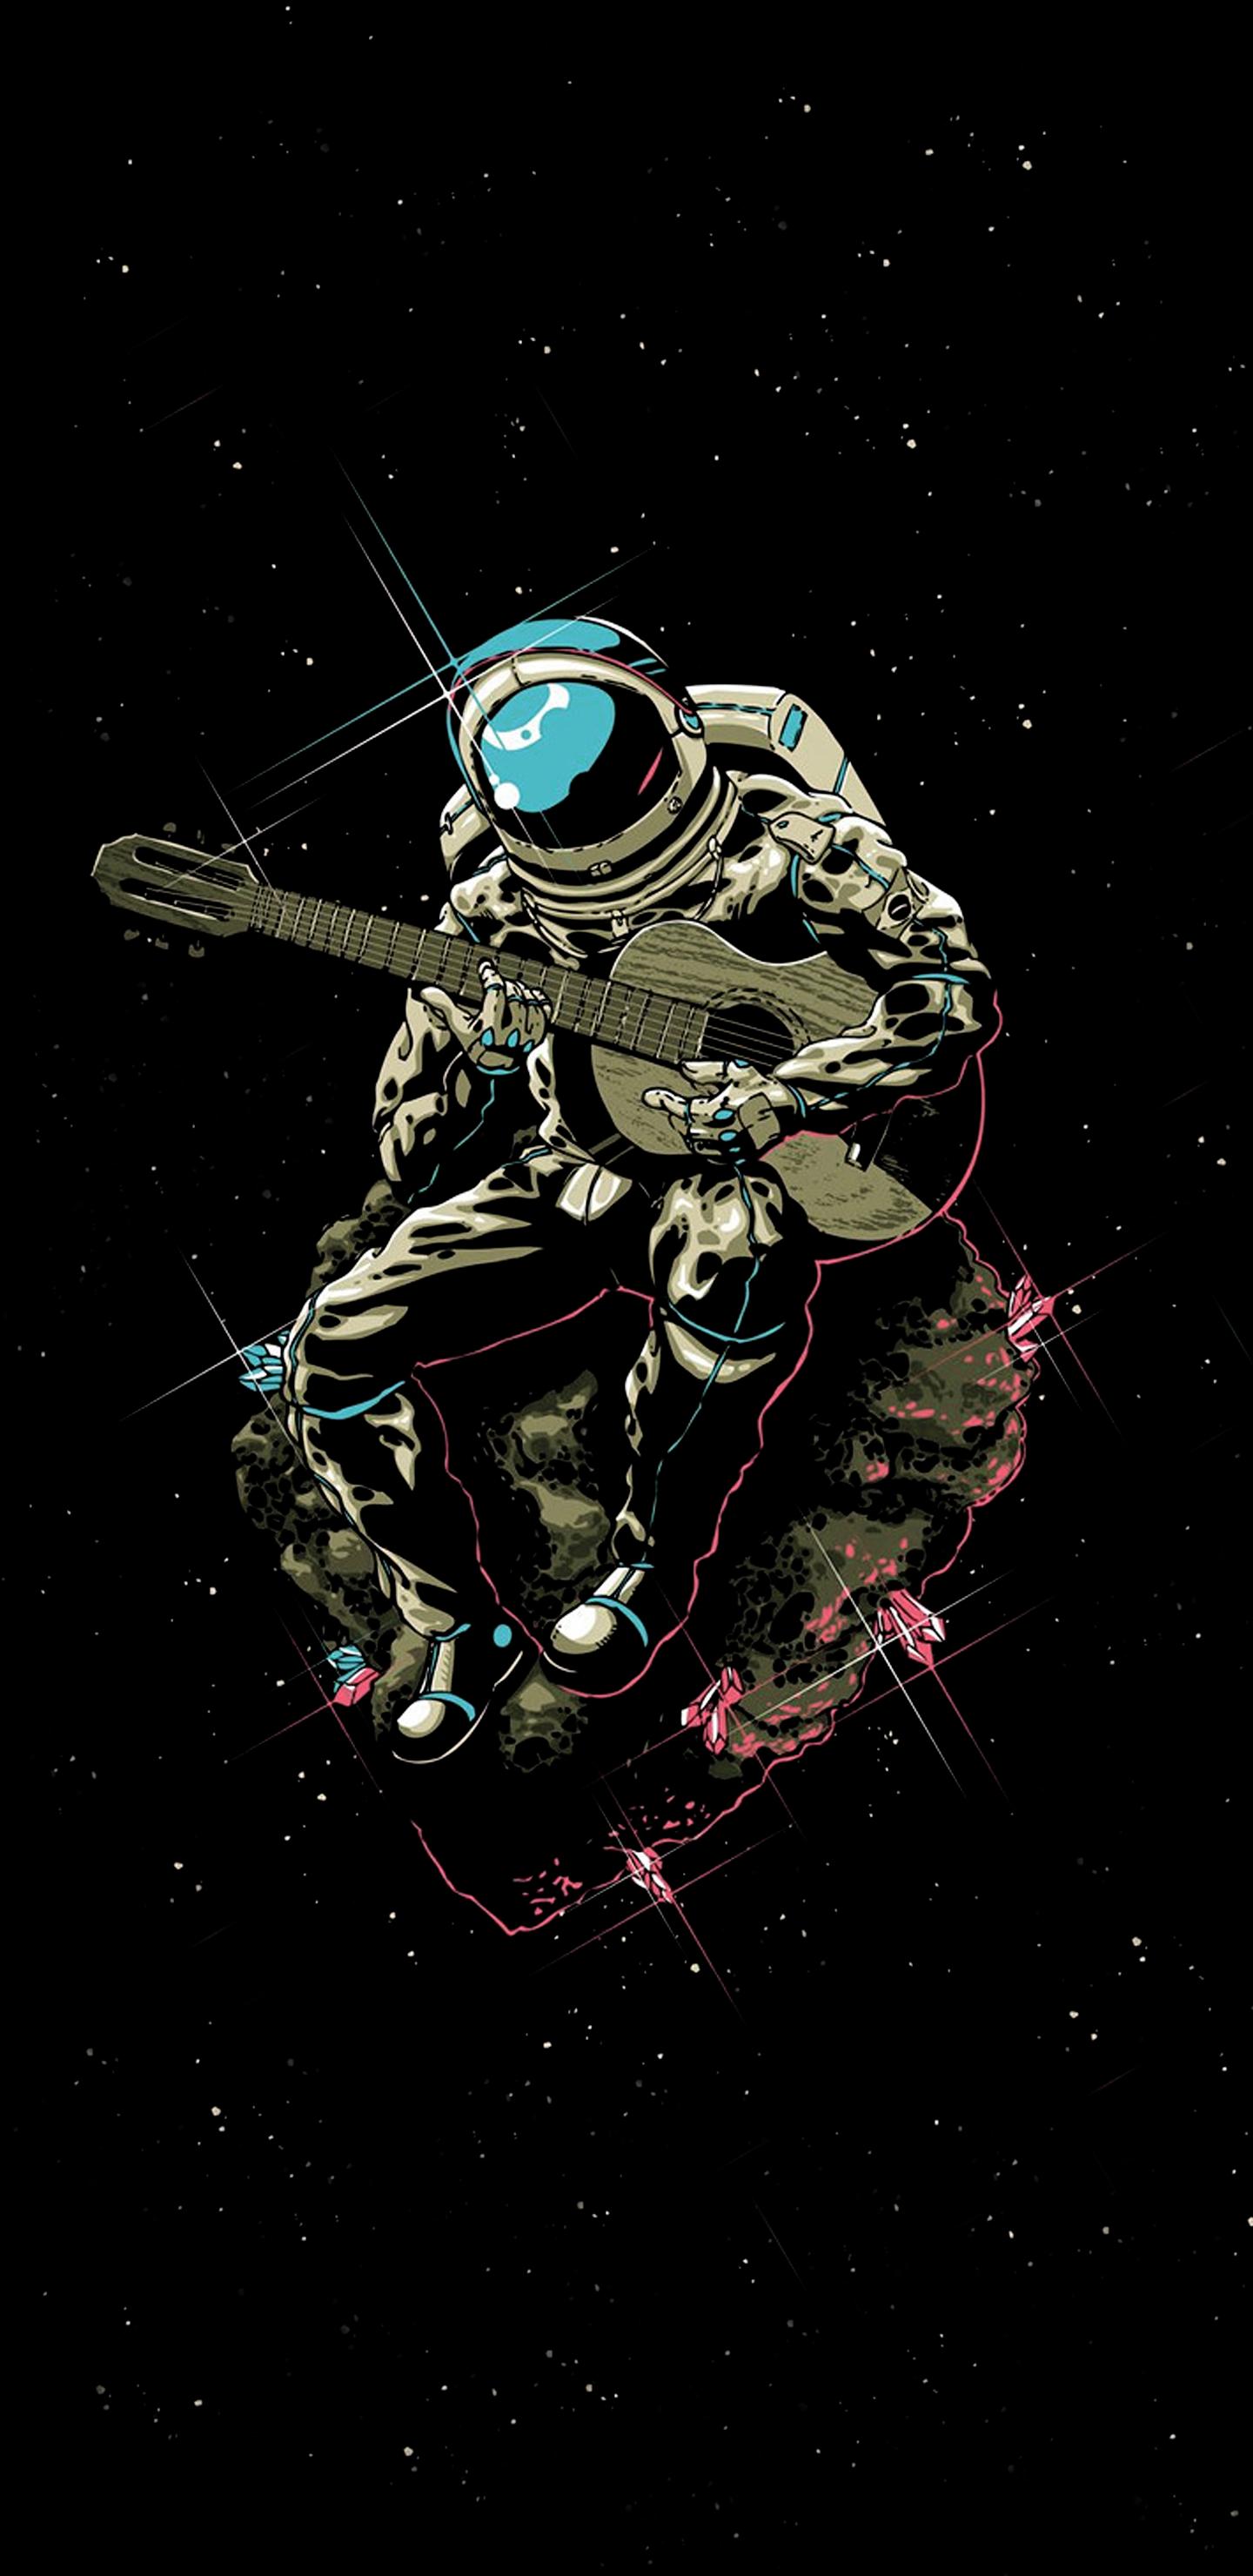 Astronaut playing the Guitar 1440x2960 S8 Wallpaper   Imgur 1440x2960